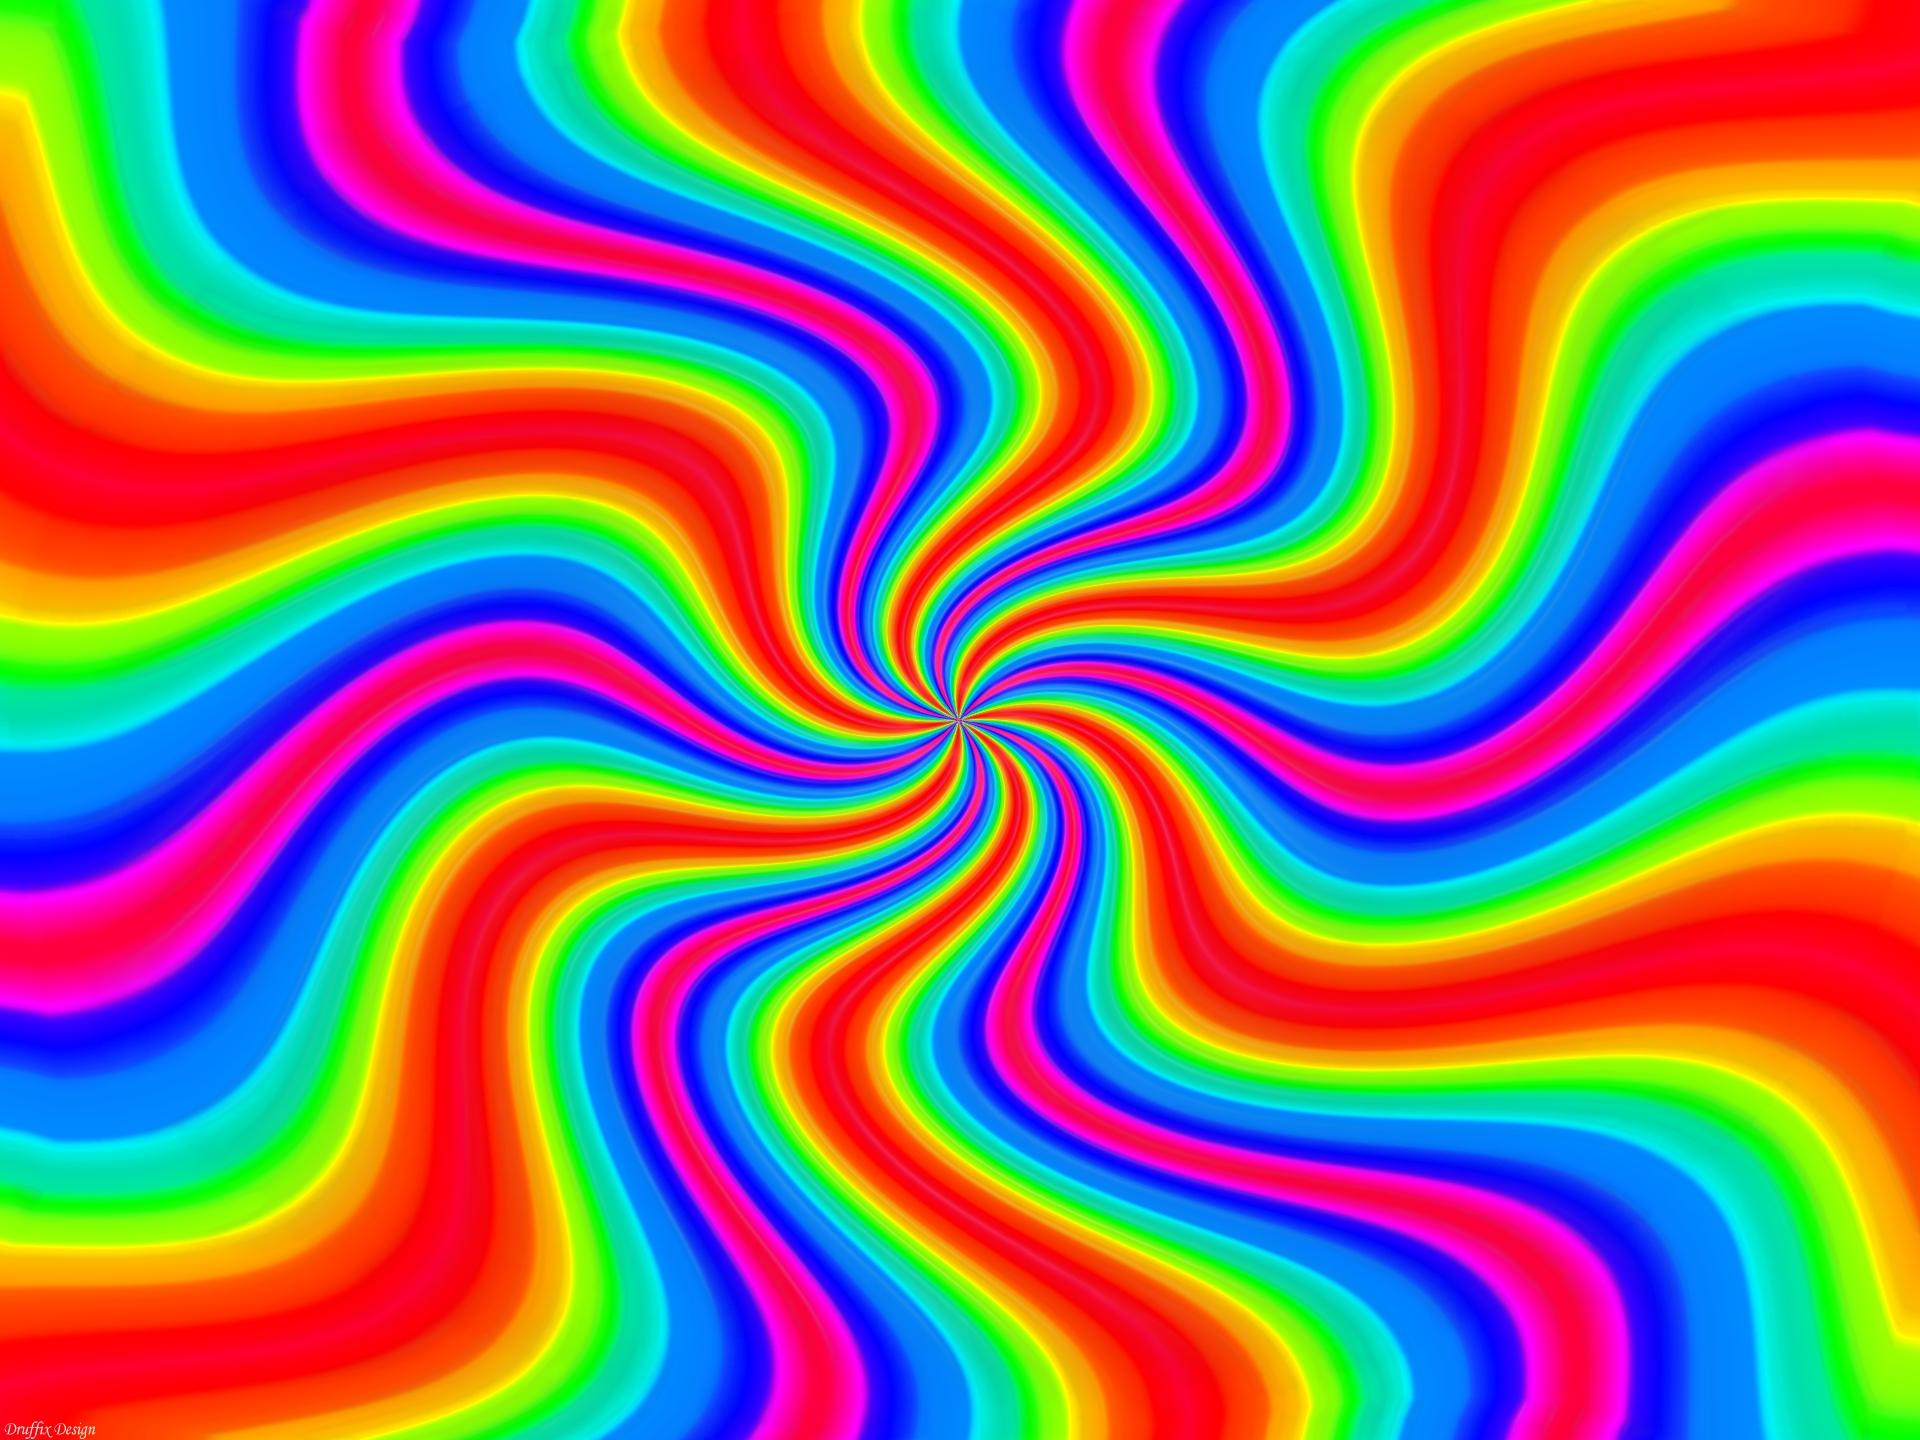 Stunning Rainbow Wallpaper - Cool Rainbow Color Background - HD Wallpaper